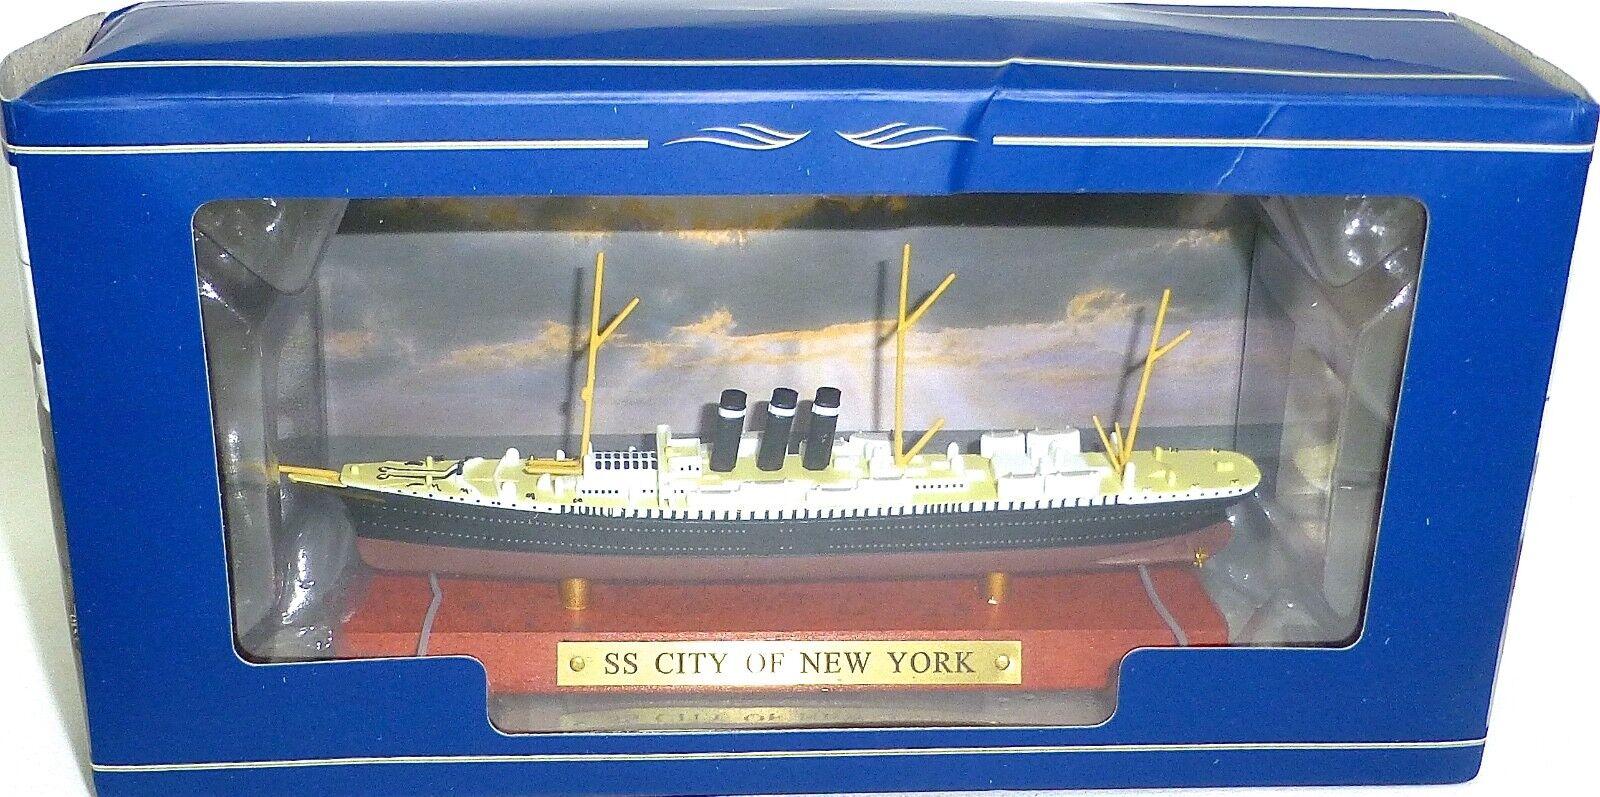 SS City of New York Neuf Dans Box 1 1250 Nouveau neuf dans sa boîte Atlas 7572011 ua1 µg